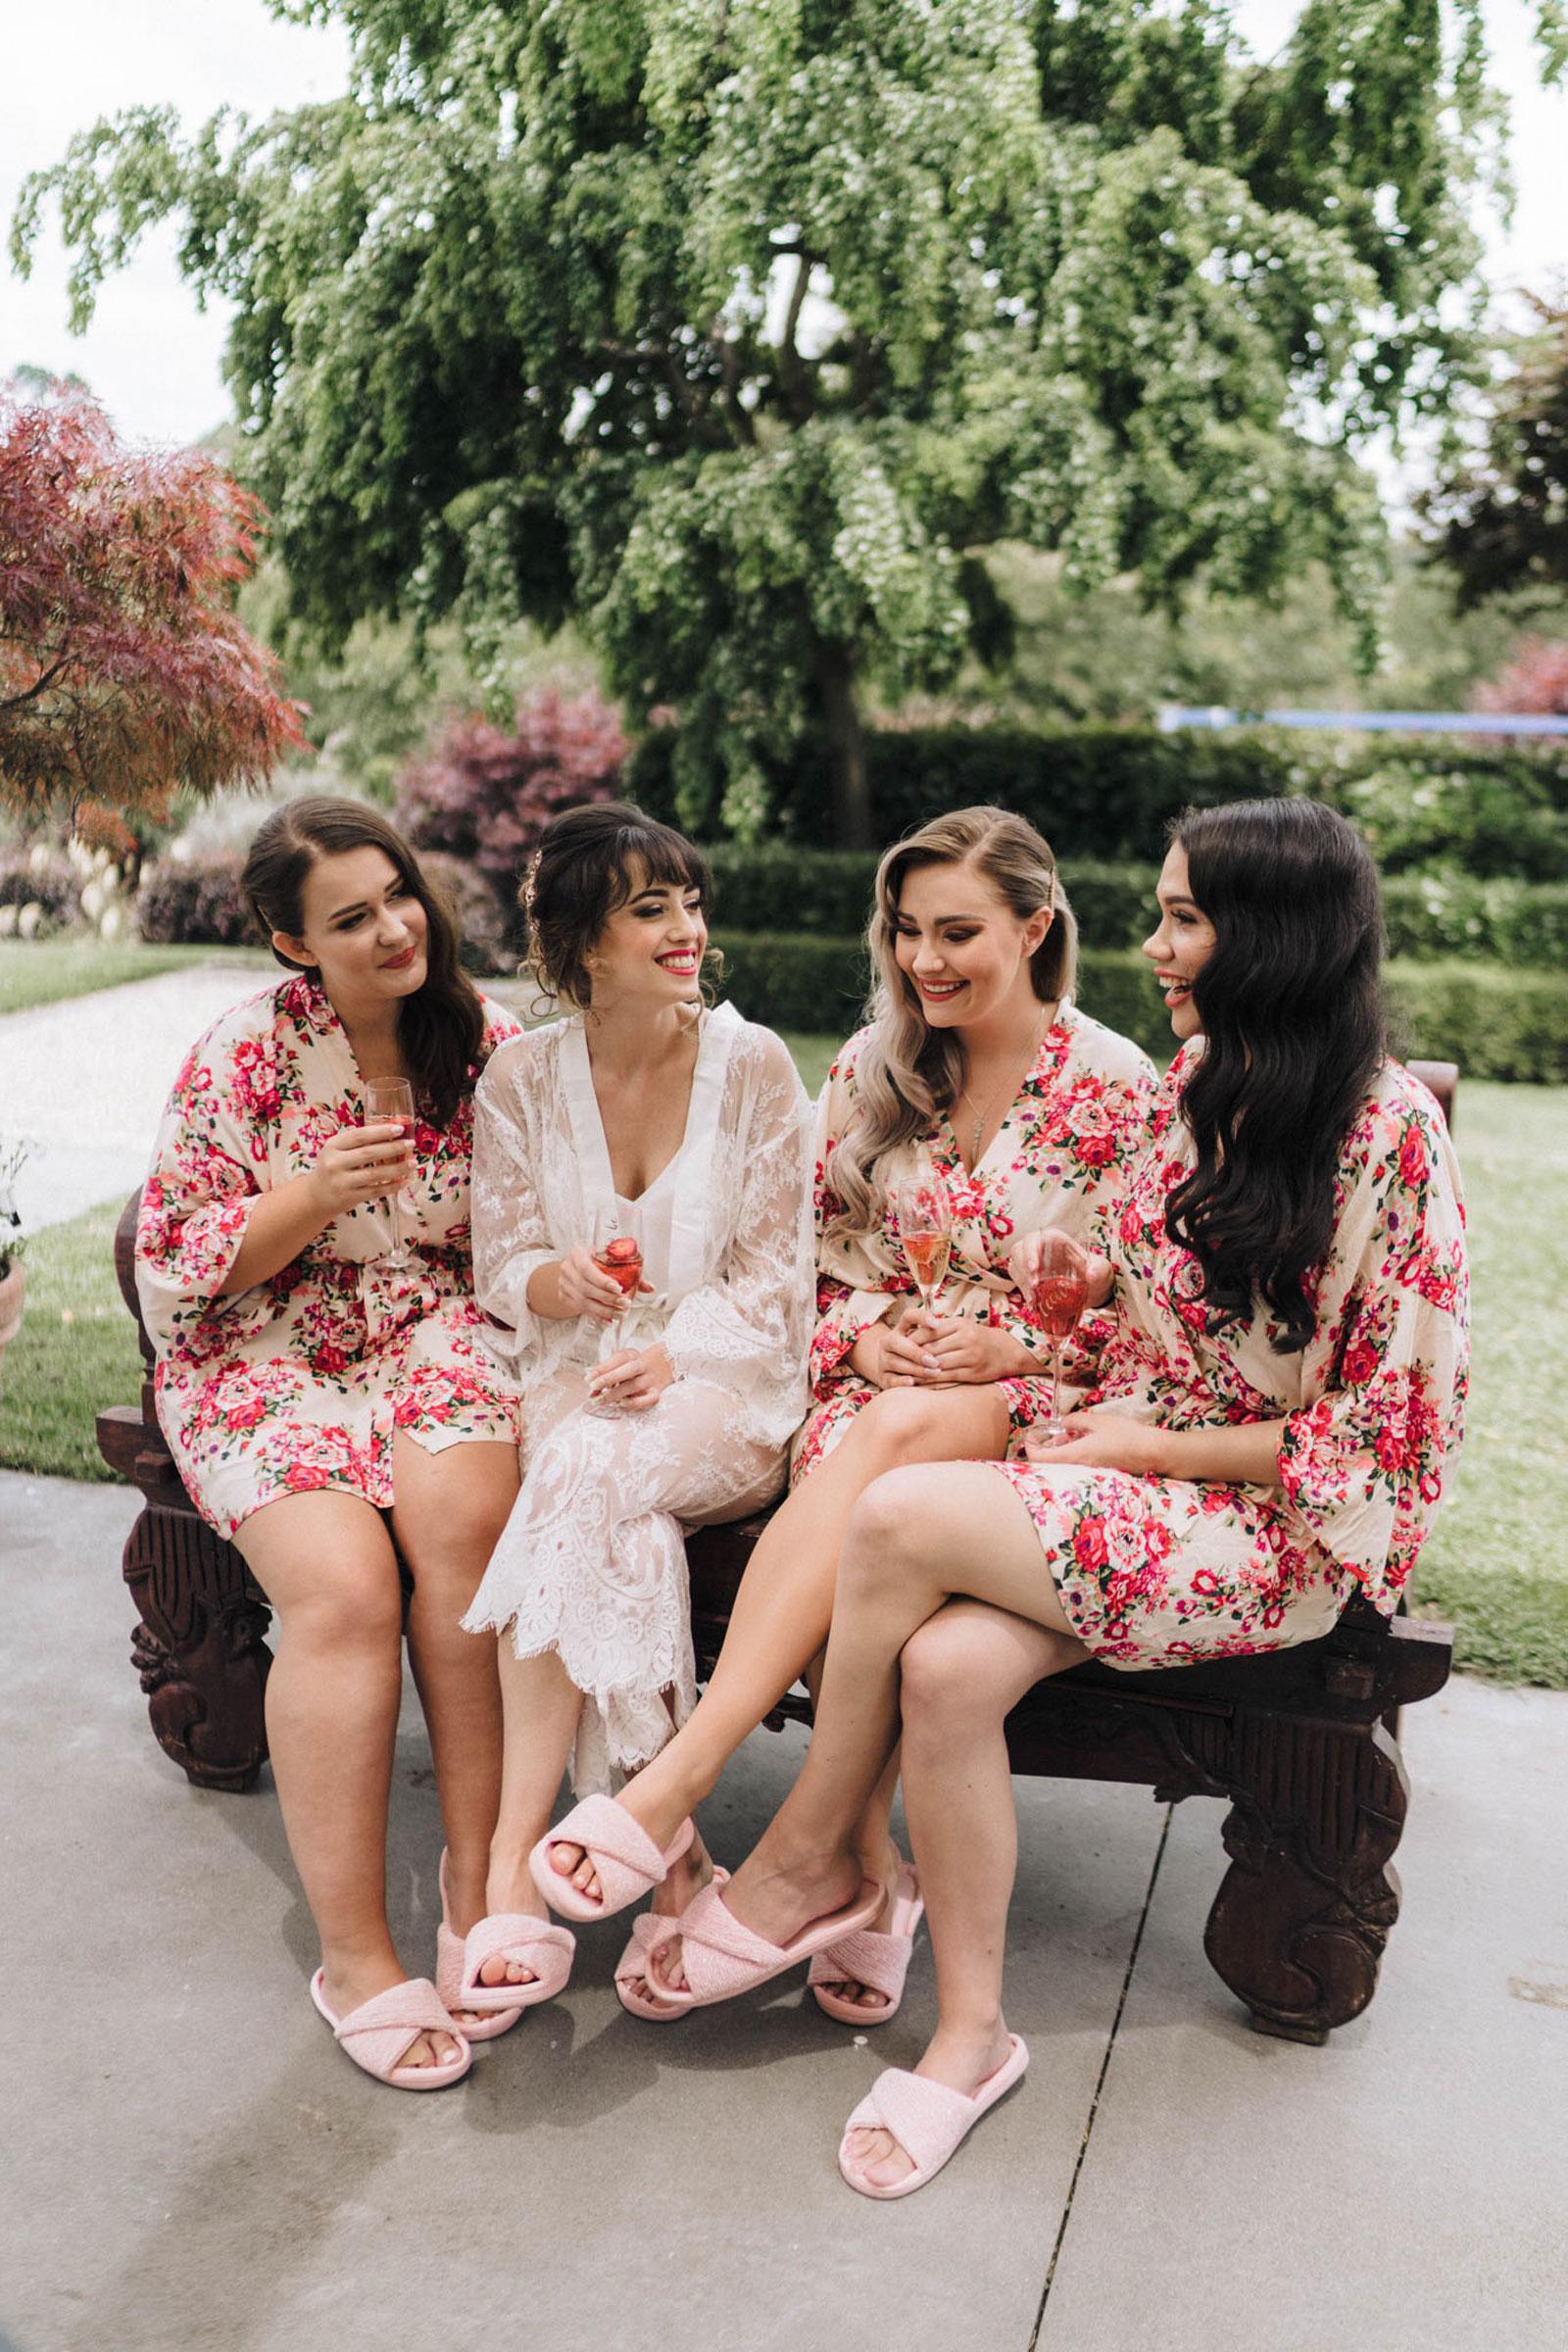 newfound-n-c-olive-tree-cottage-tauranga-wedding-photographer-63